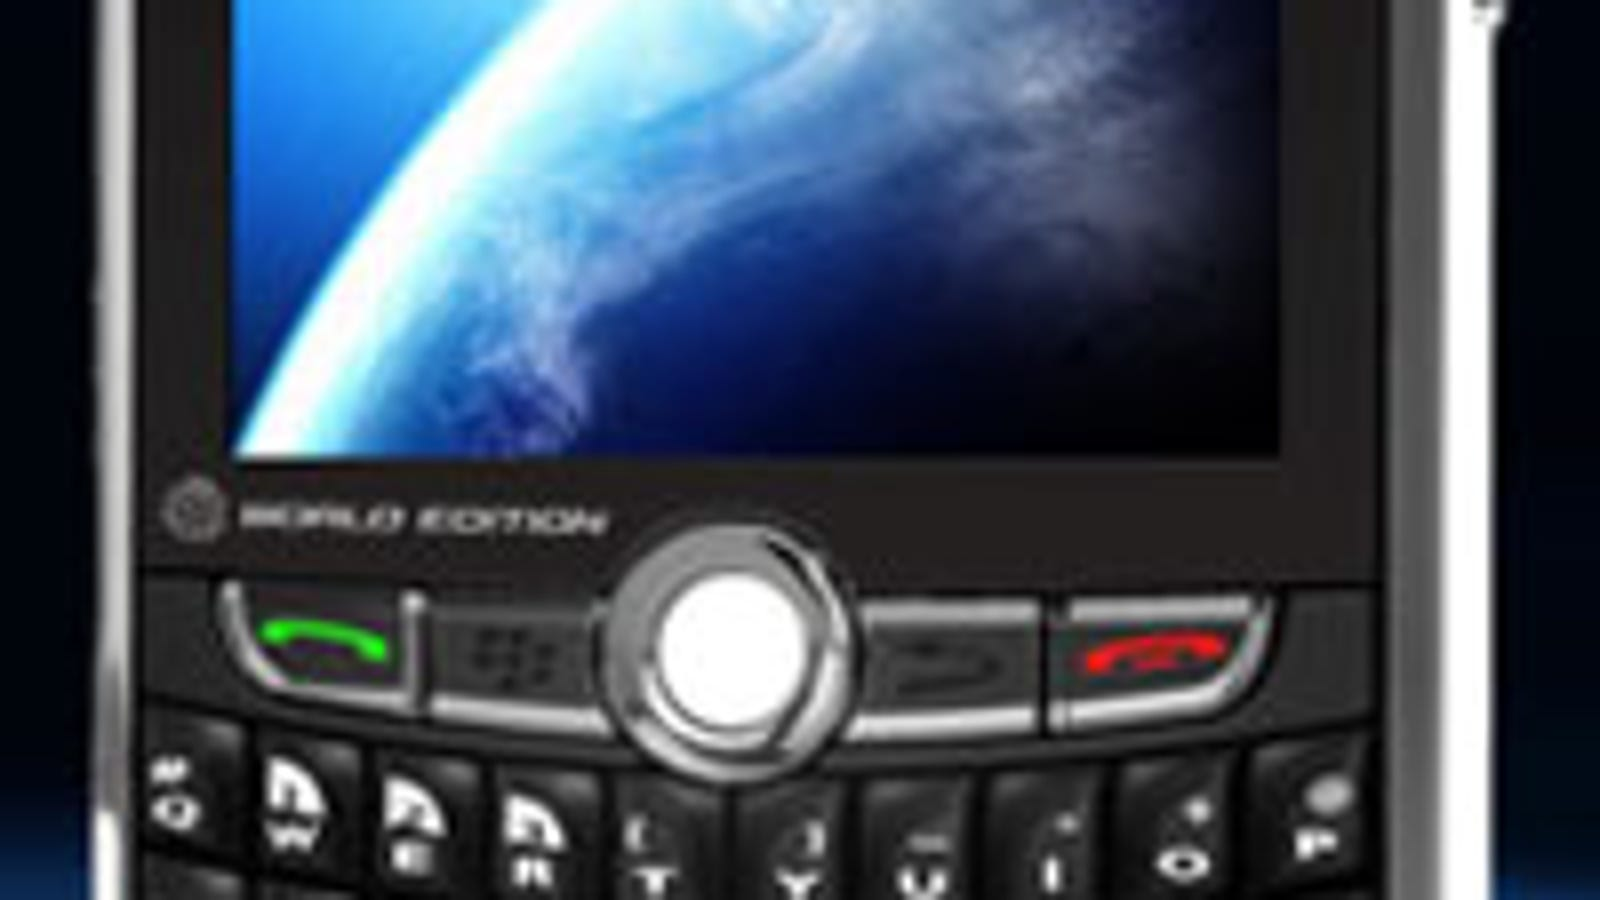 BLACKBERRY 8830 MODEM DRIVER FREE